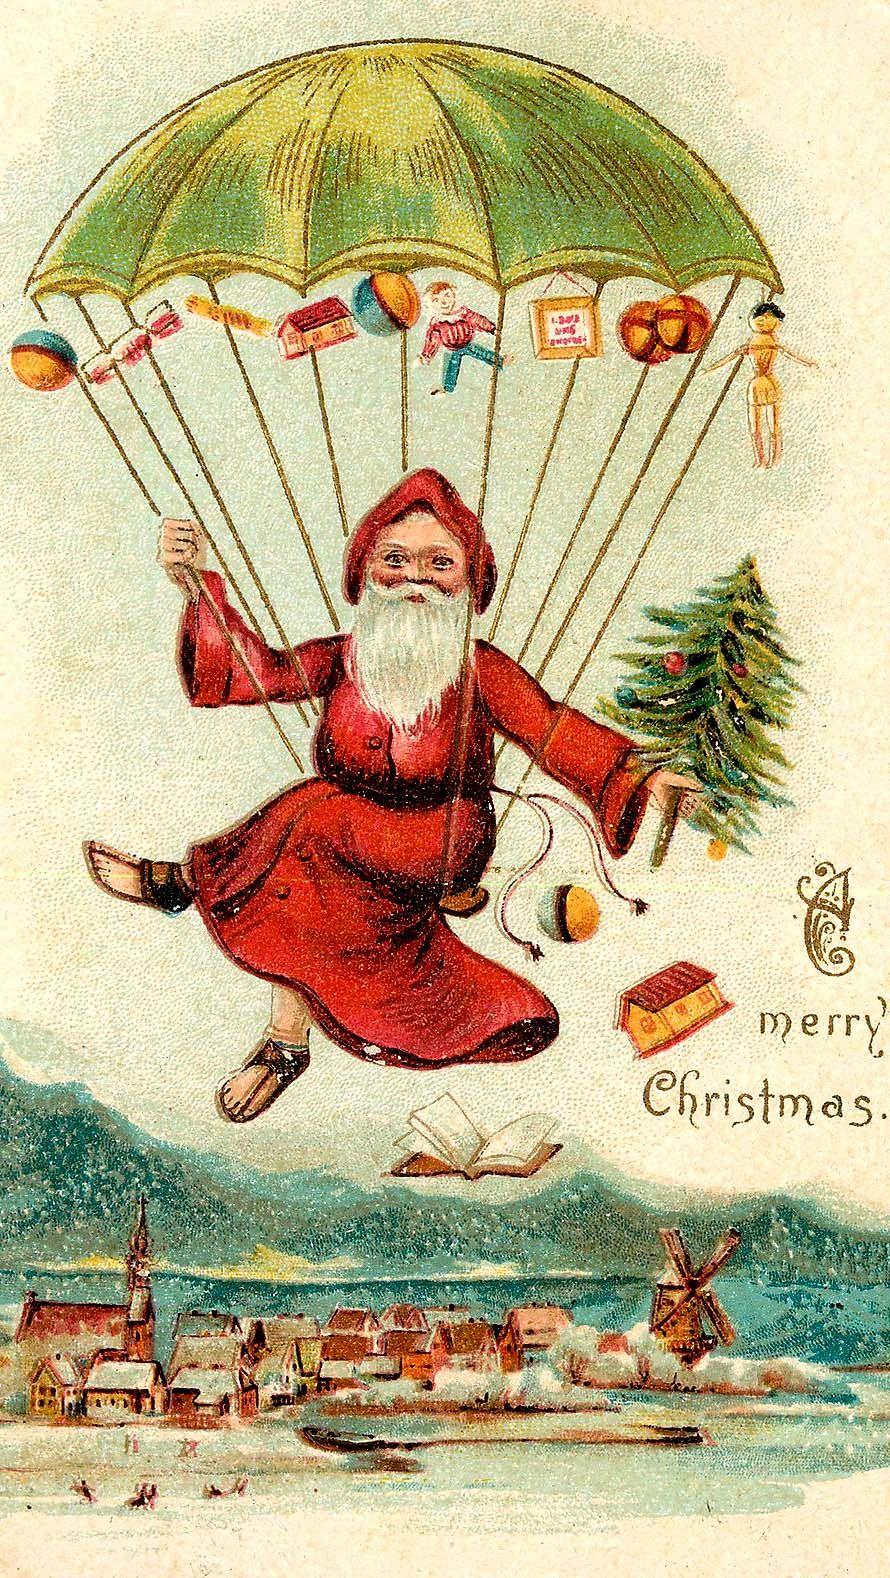 Vintage Christmas Card: Santa dropping gifts from parachute | I ...